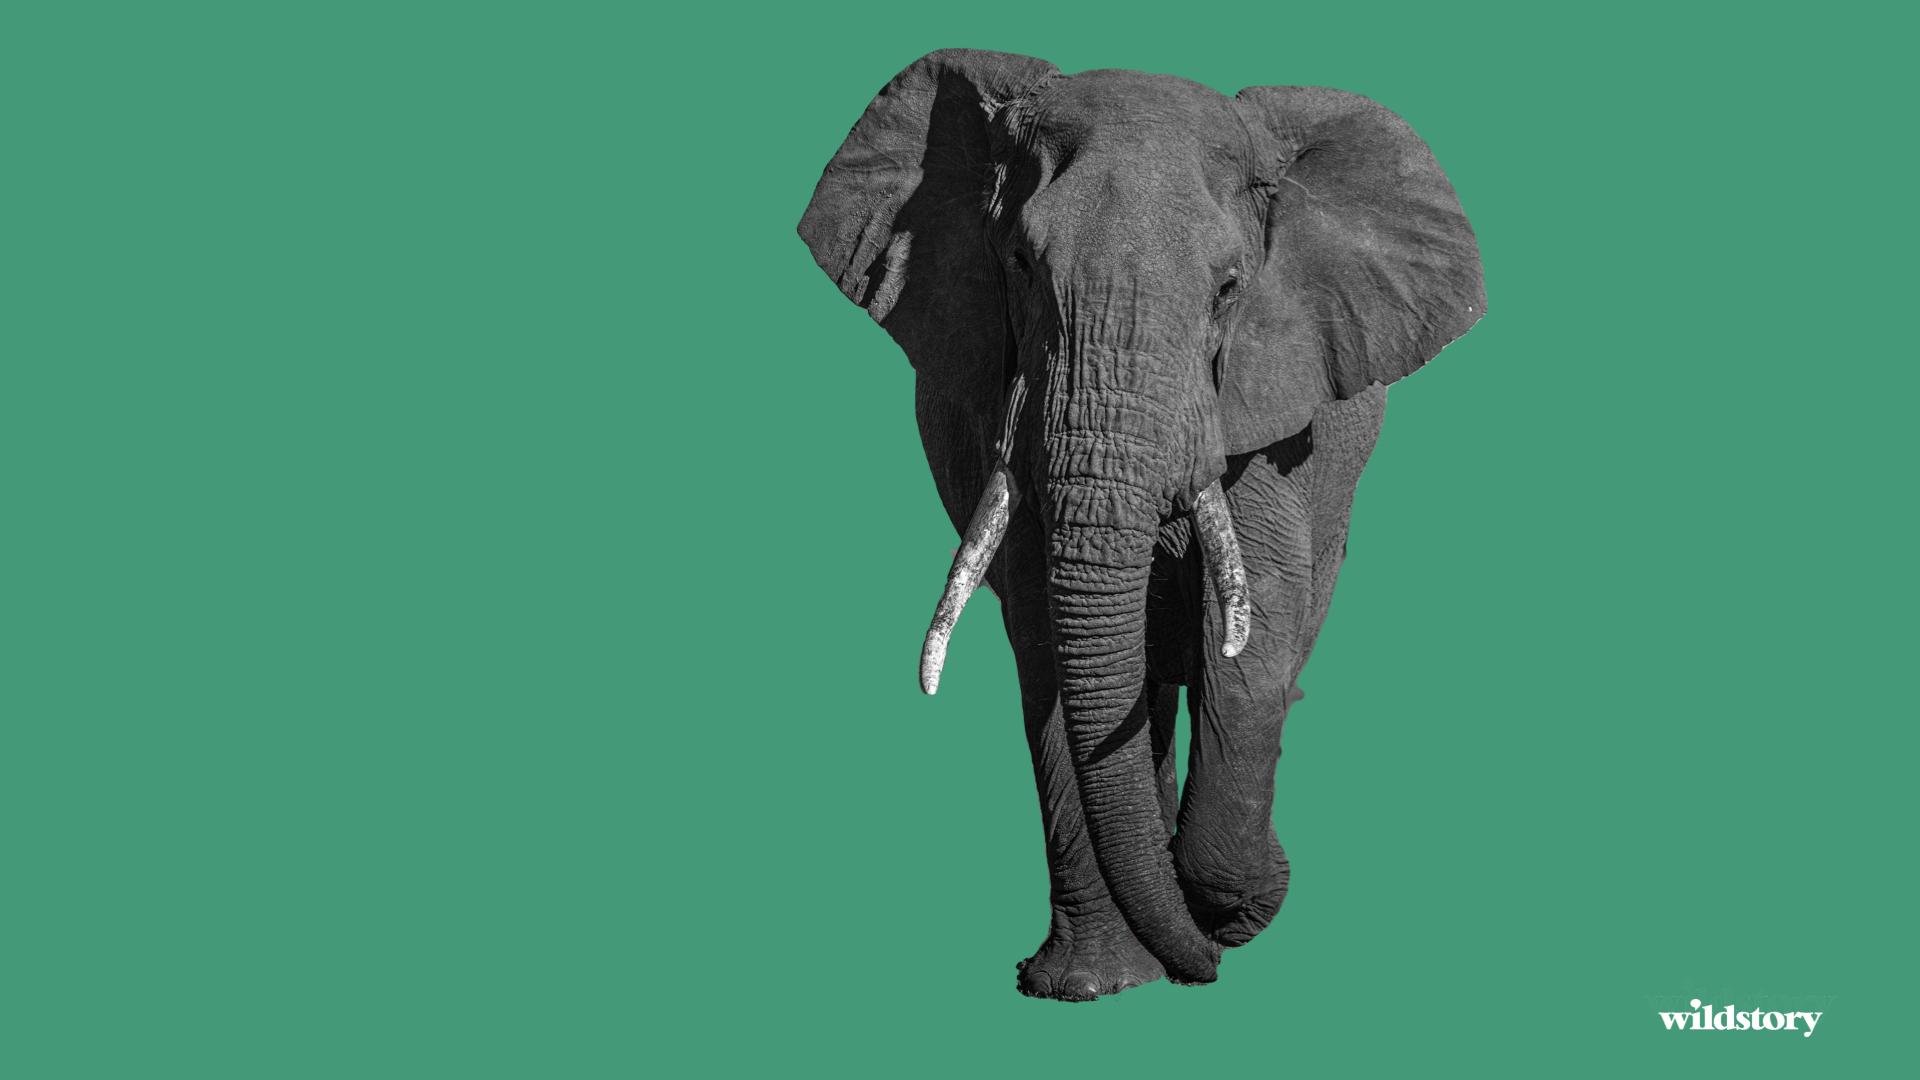 The elepant.